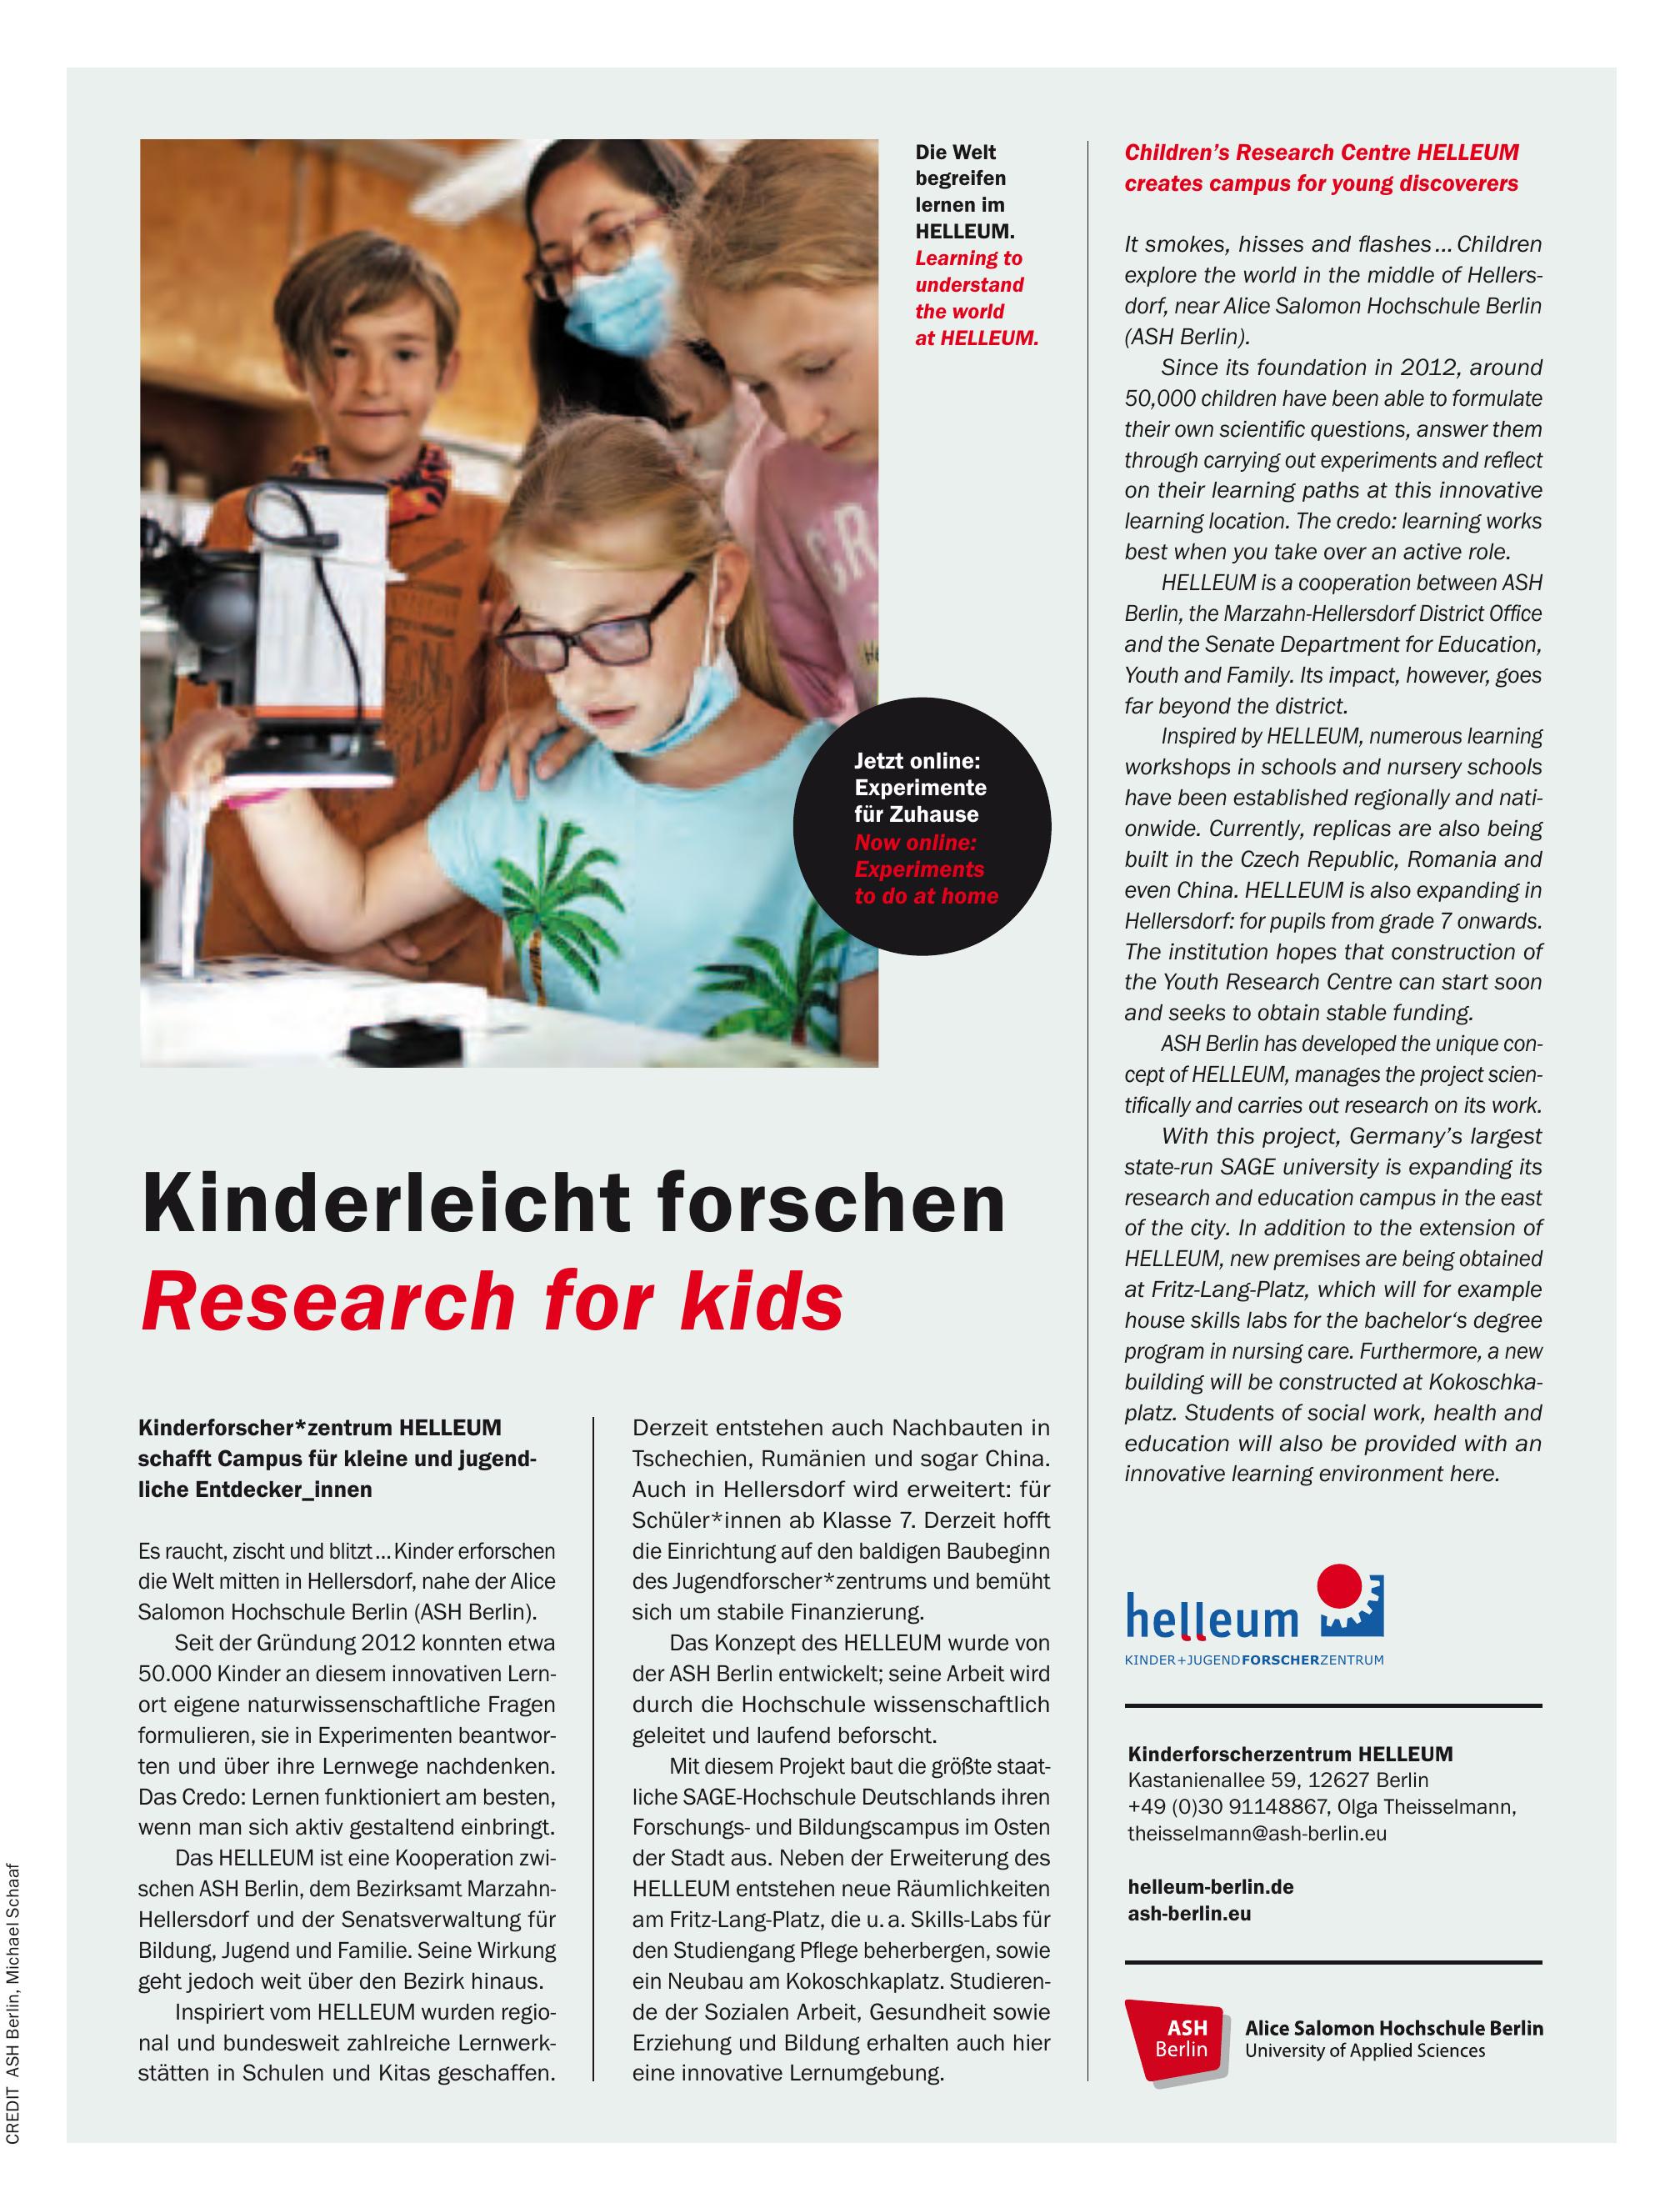 Kinderforscherzentrum HELLEUM